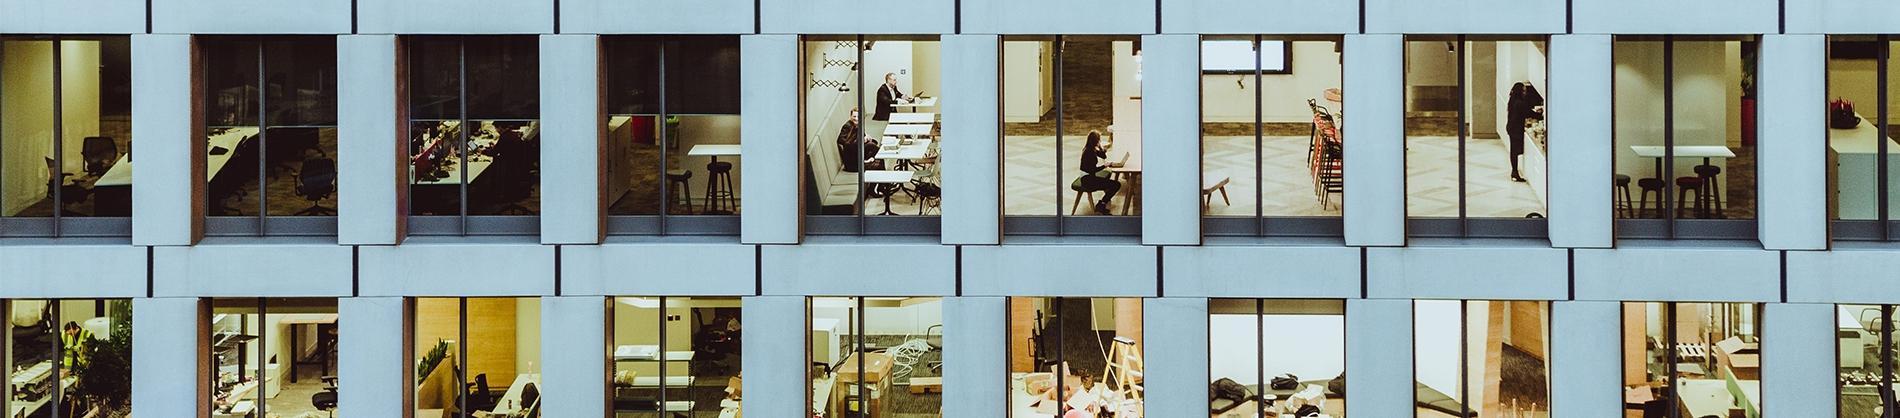 A row of Office windows